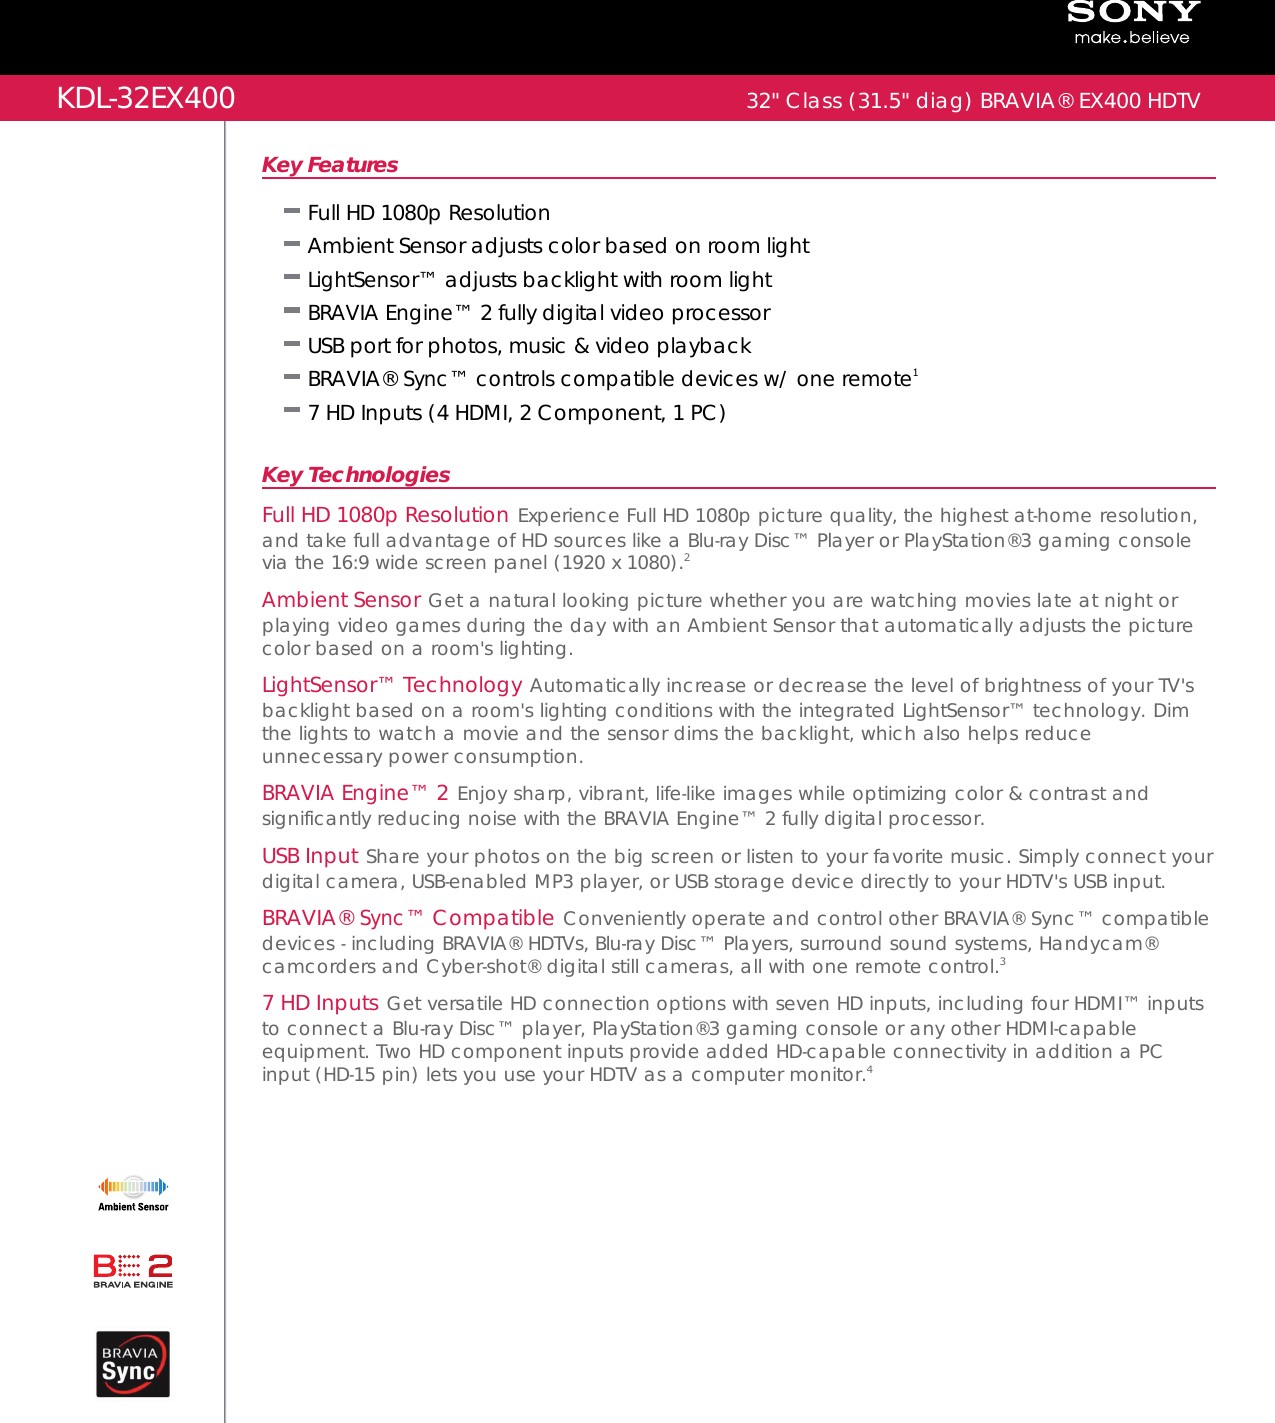 sony kdl 32ex400 user manual marketing specifications kdl32ex400 mksp rh usermanual wiki sony kdl-32ex400 manual pdf sony kdl-32ex400 manual pdf